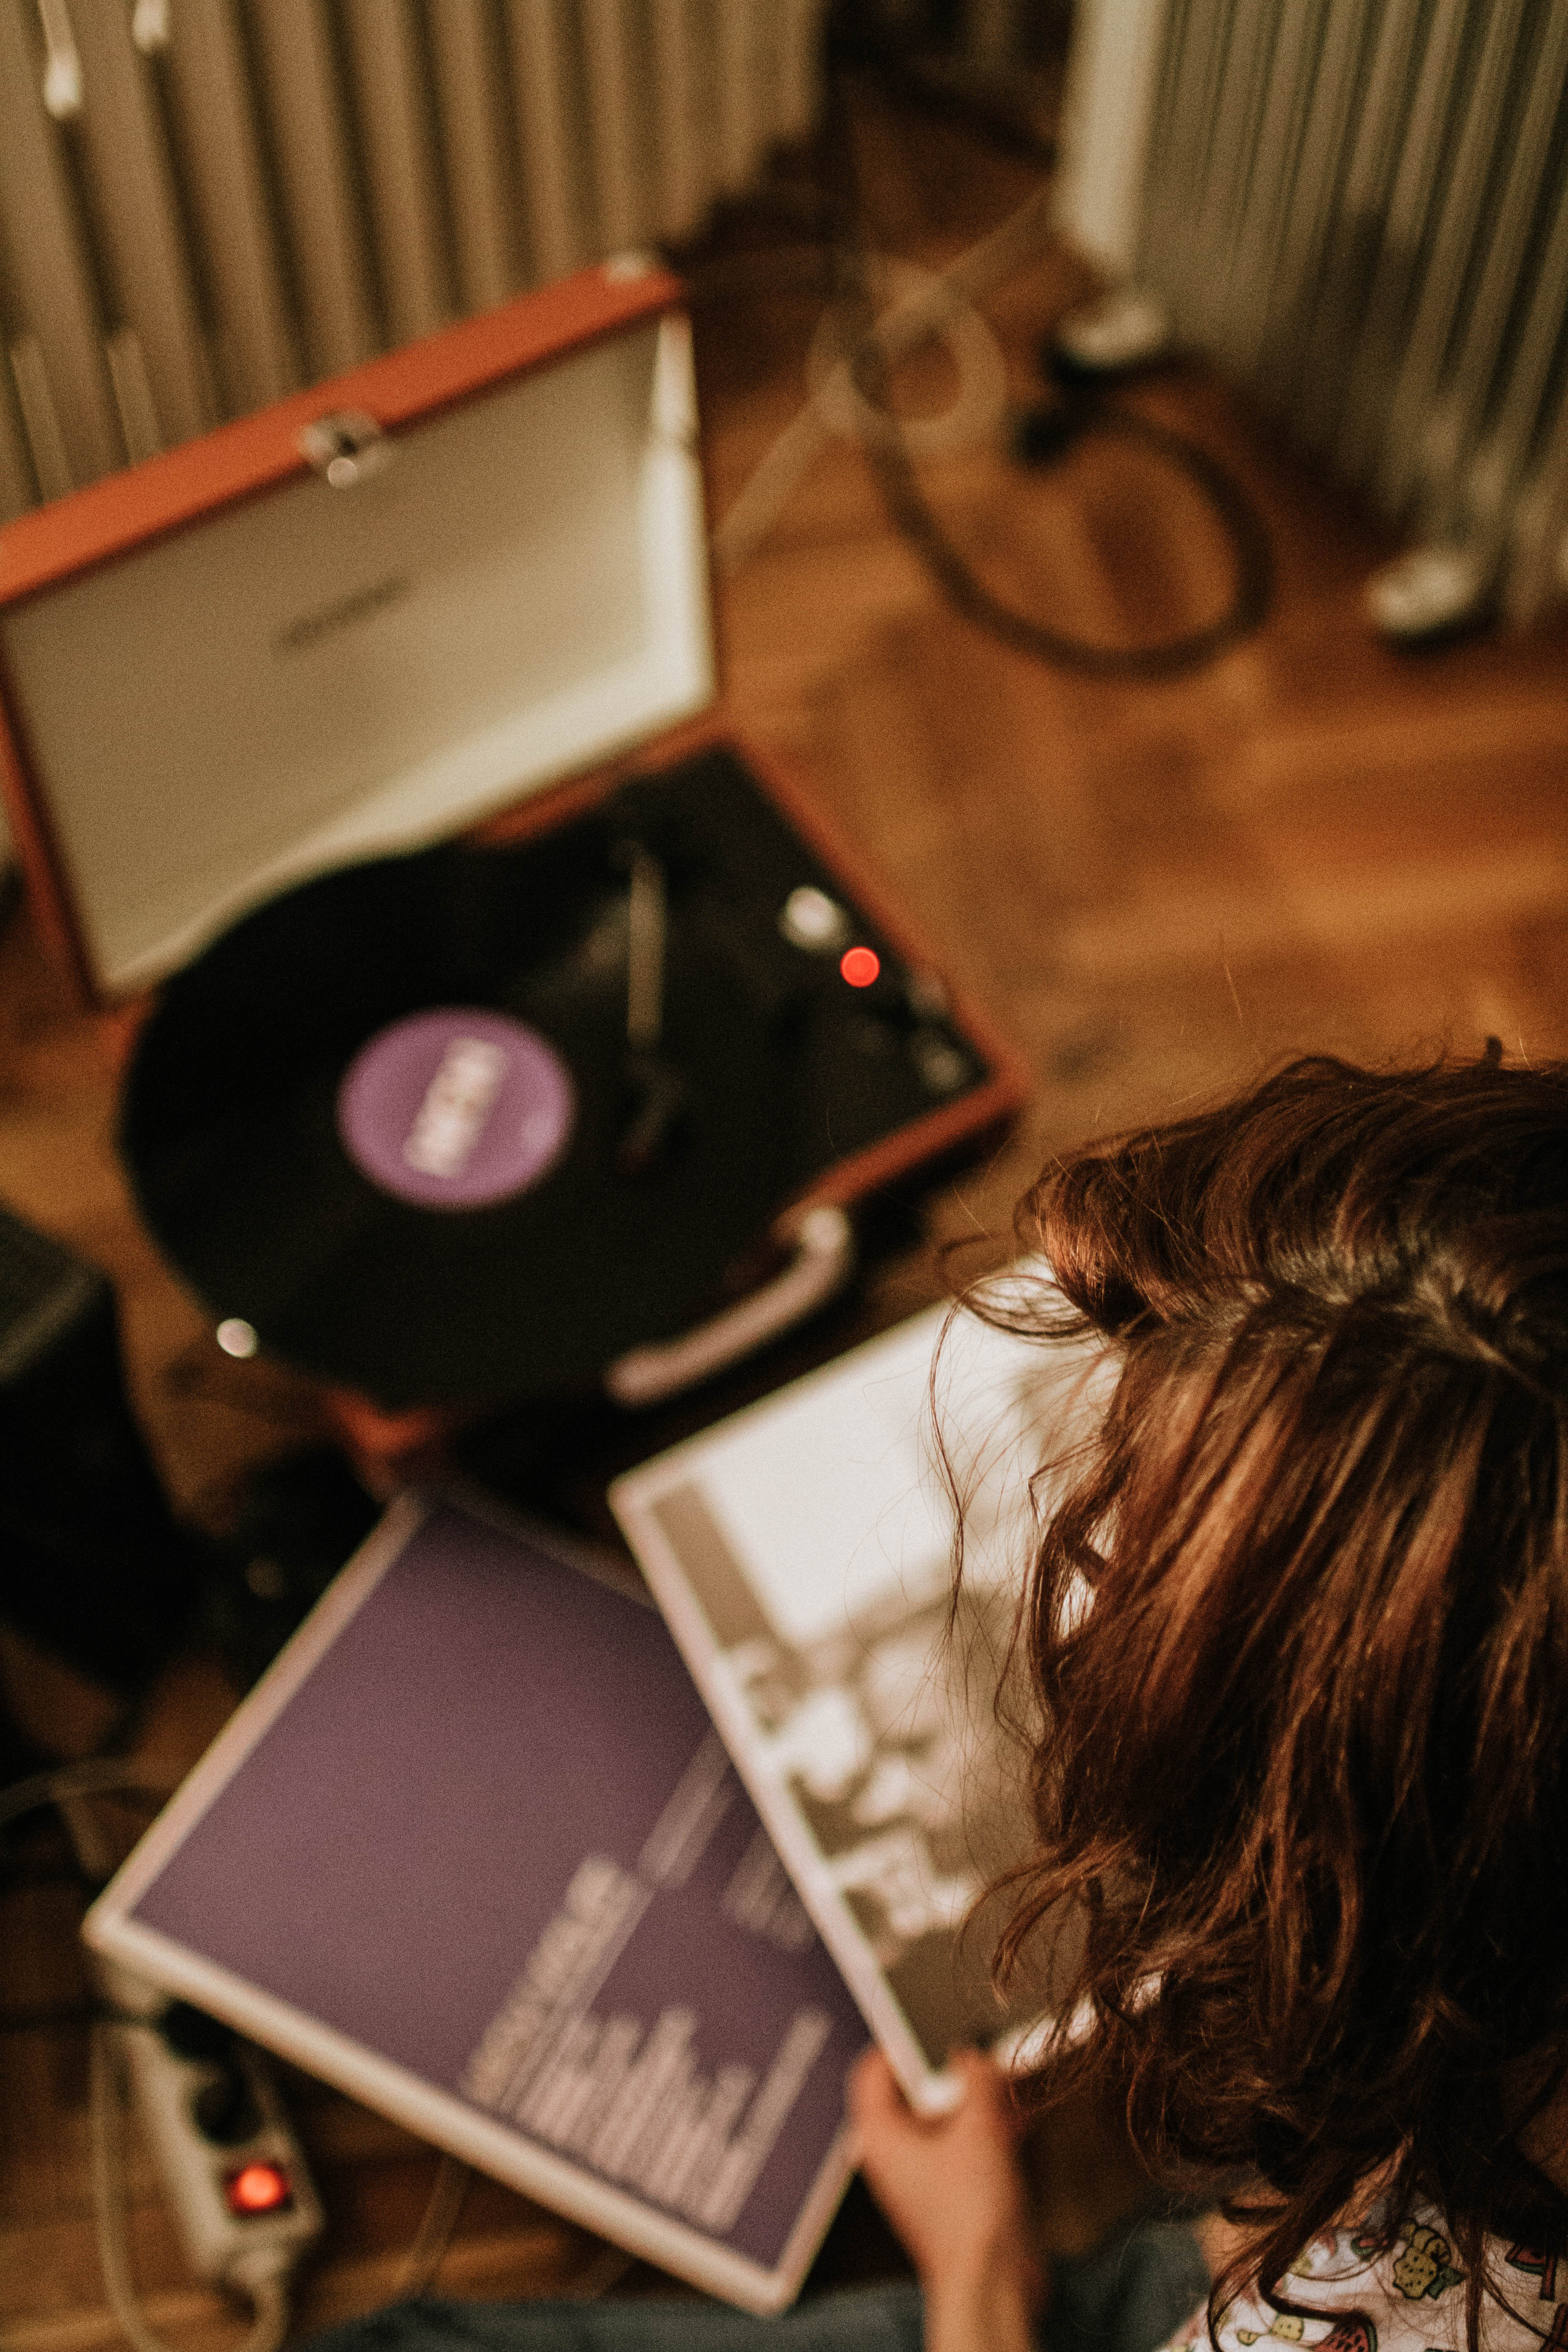 Person Holding Vinyl Sleeve